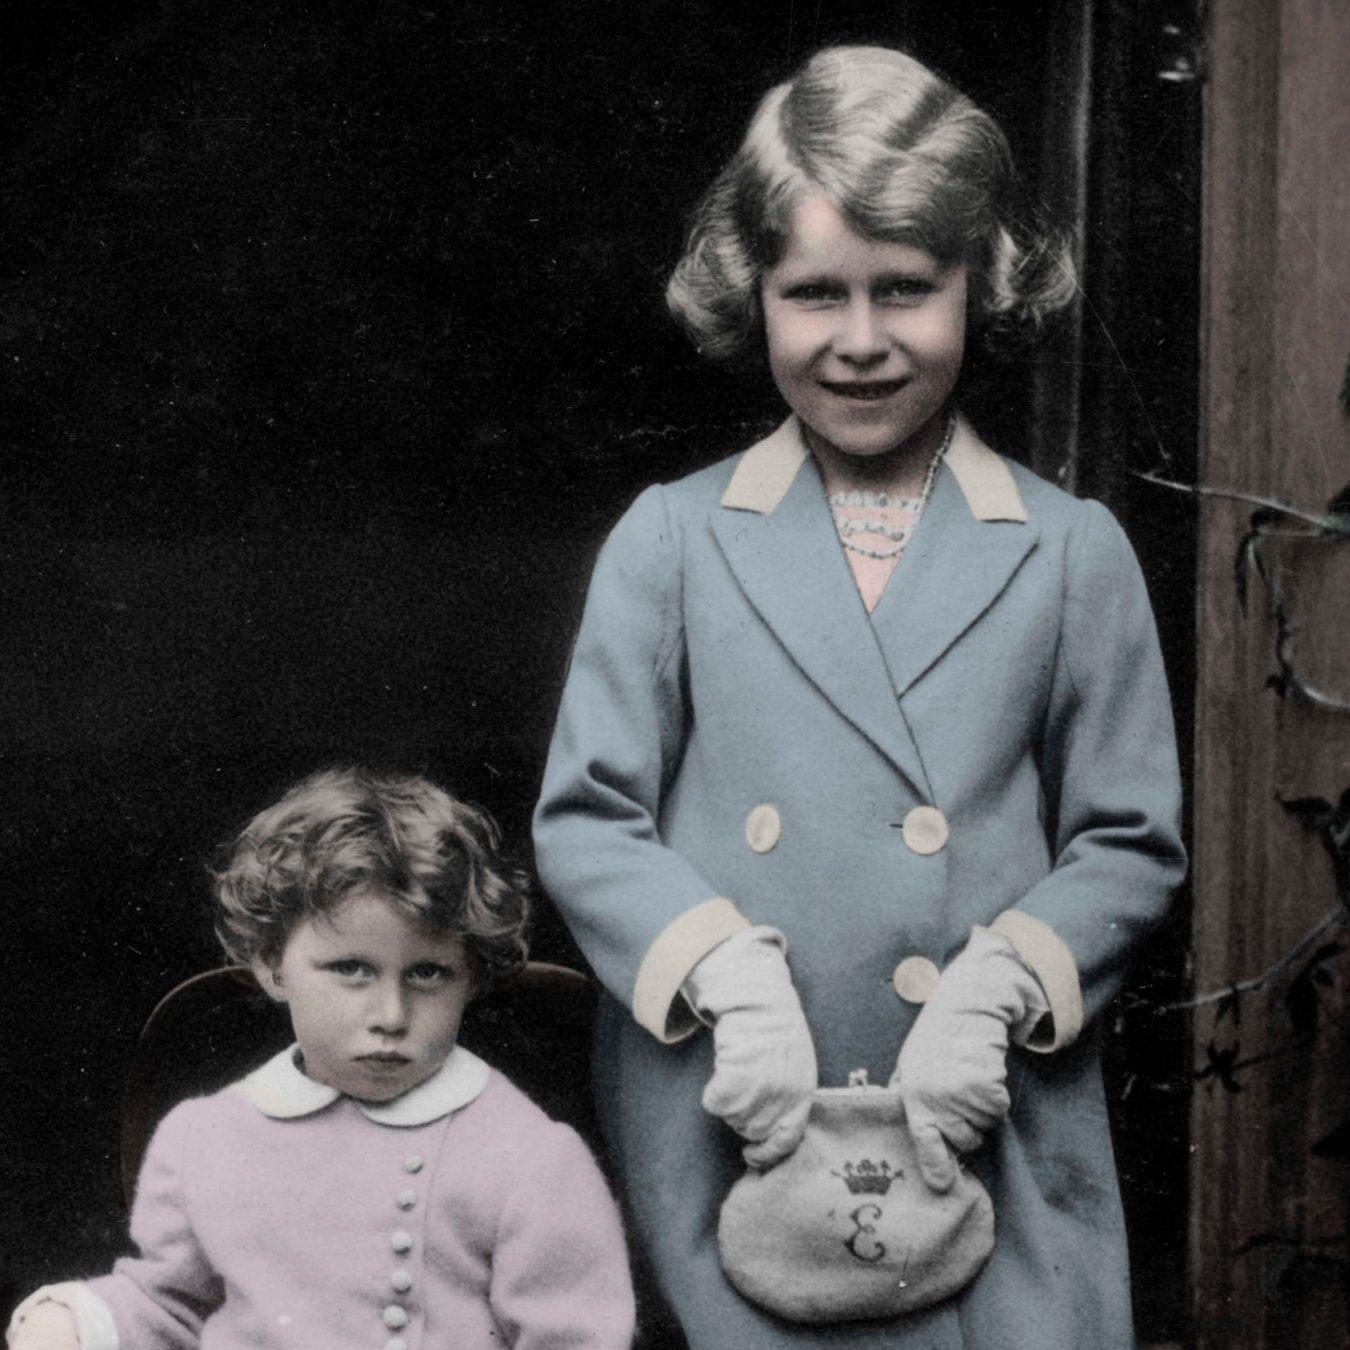 Princess Margaret and Princess Elizabeth